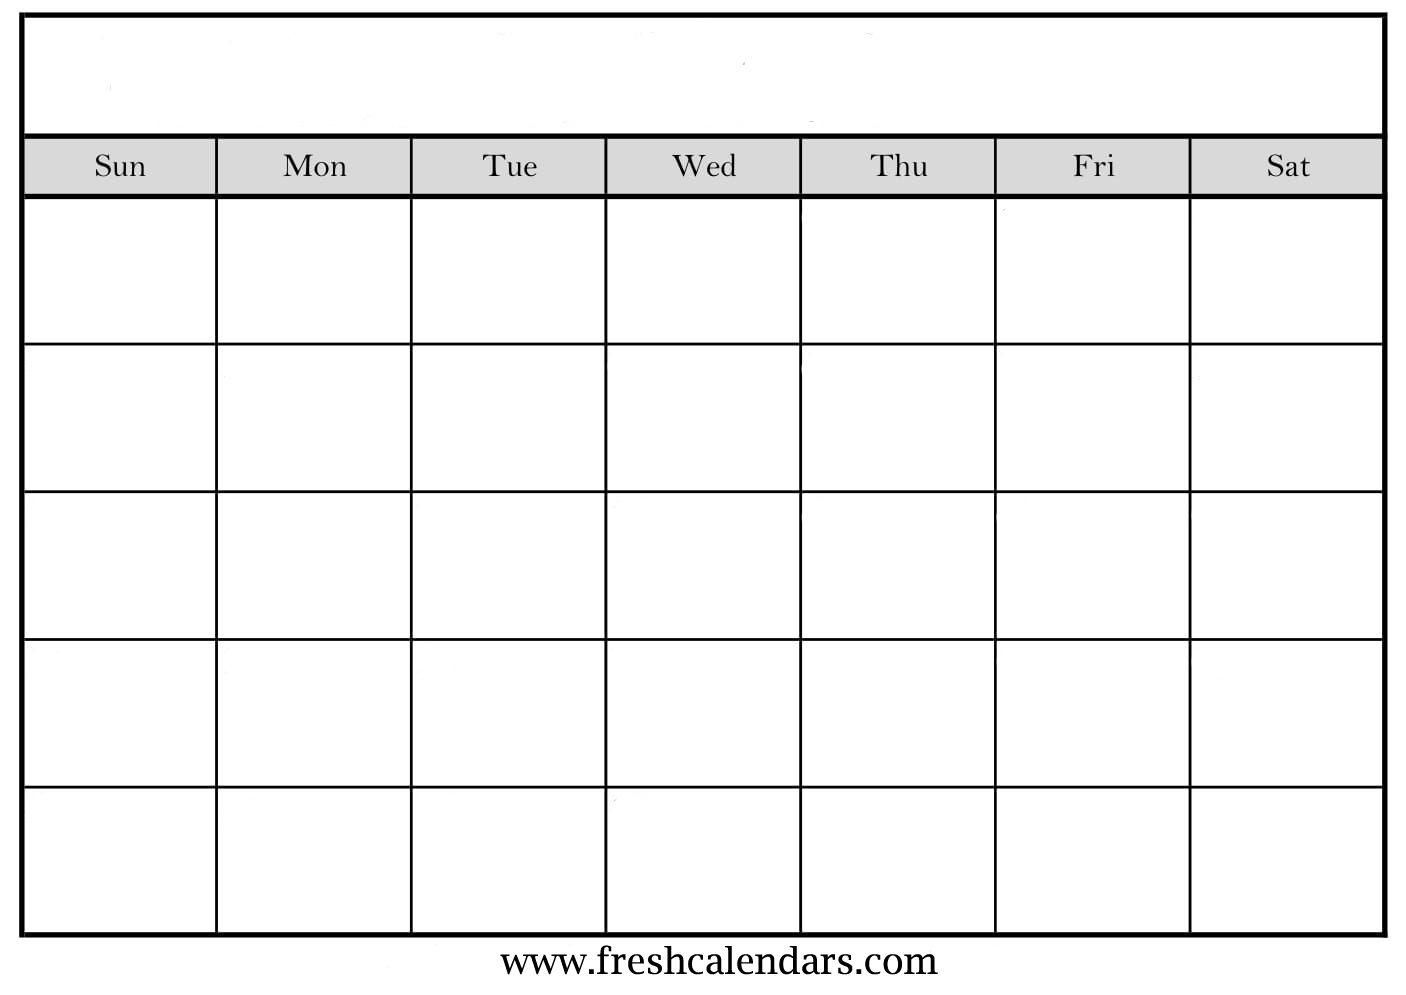 Blank Calendar: Wonderfully Printable 2019 Templates with Blank Calendar To Fill In